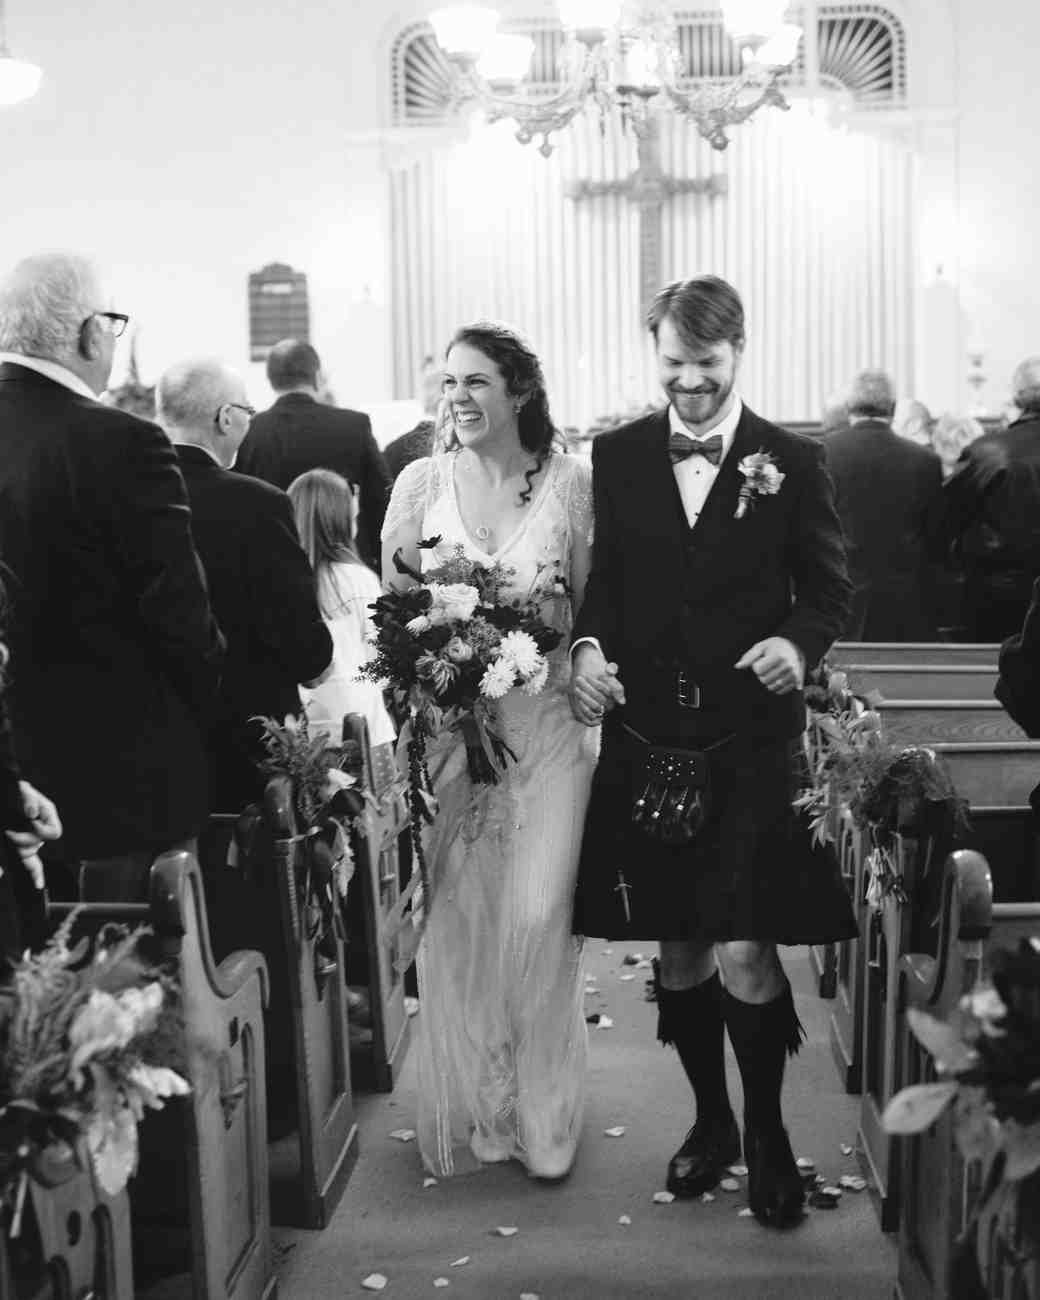 jayme-jeff-wedding-ceremony-0614.jpg